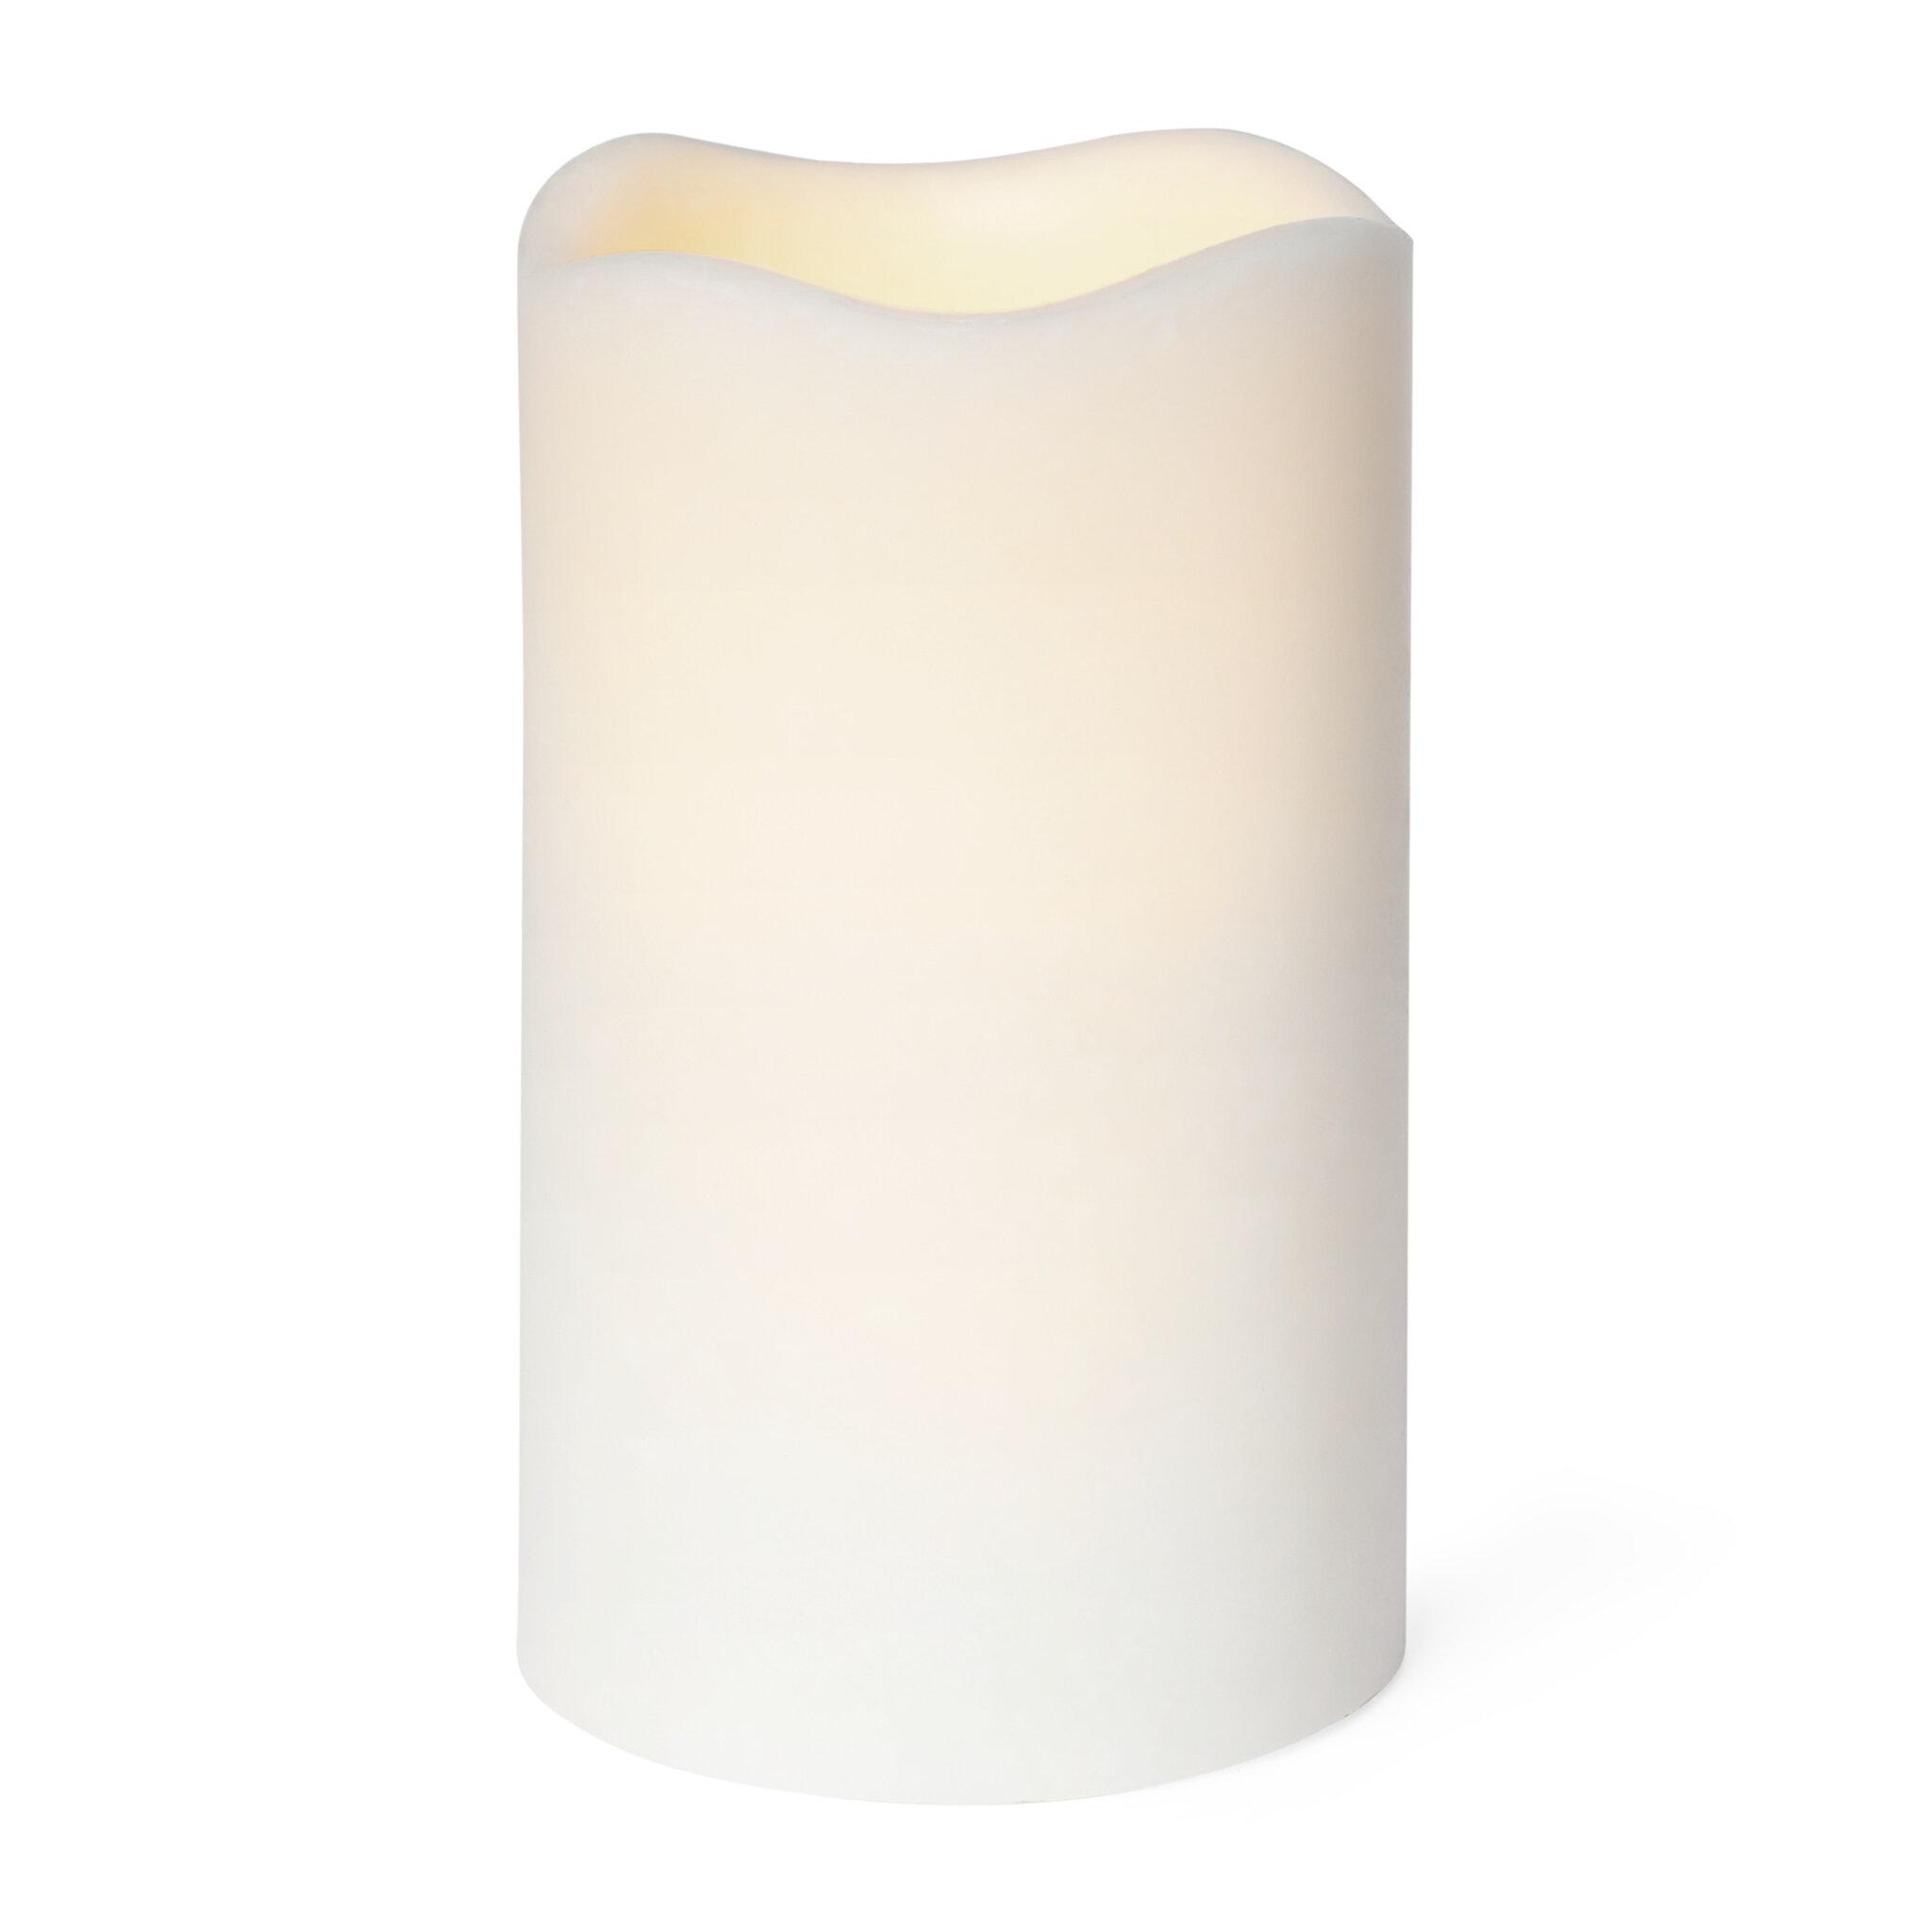 LED Blockljus 12,5 cm